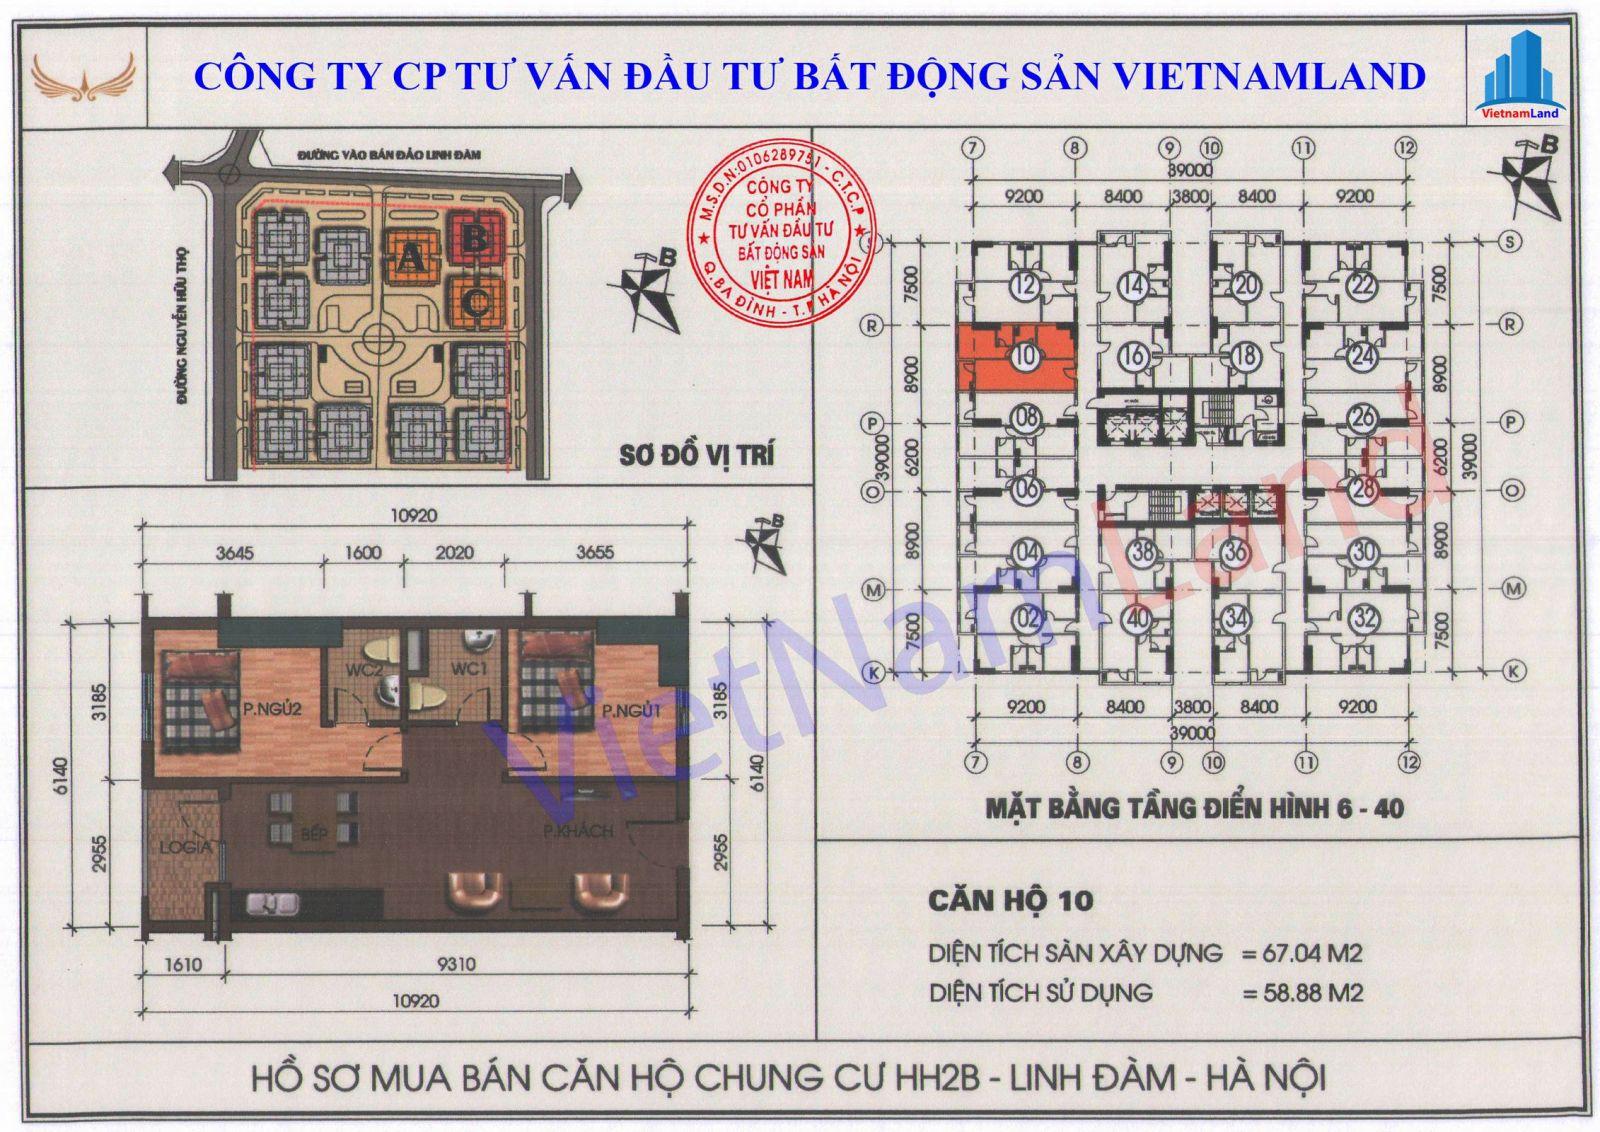 can-10-hh2b-linh-dam